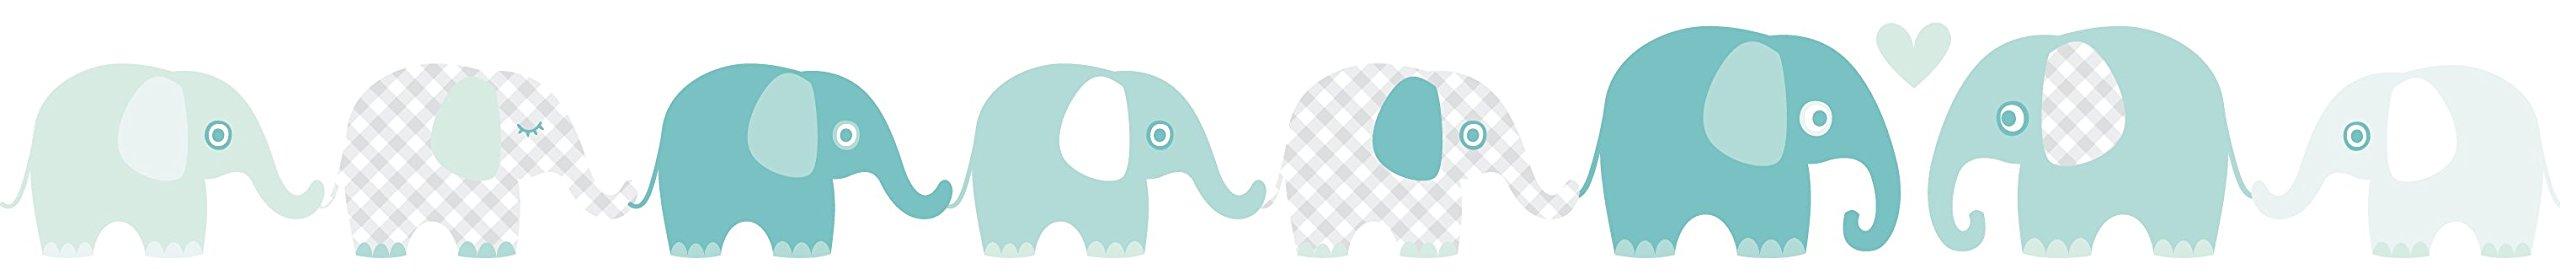 Lovely Label Bordure Selbstklebend Elefanten Mint Grau Wandbordure